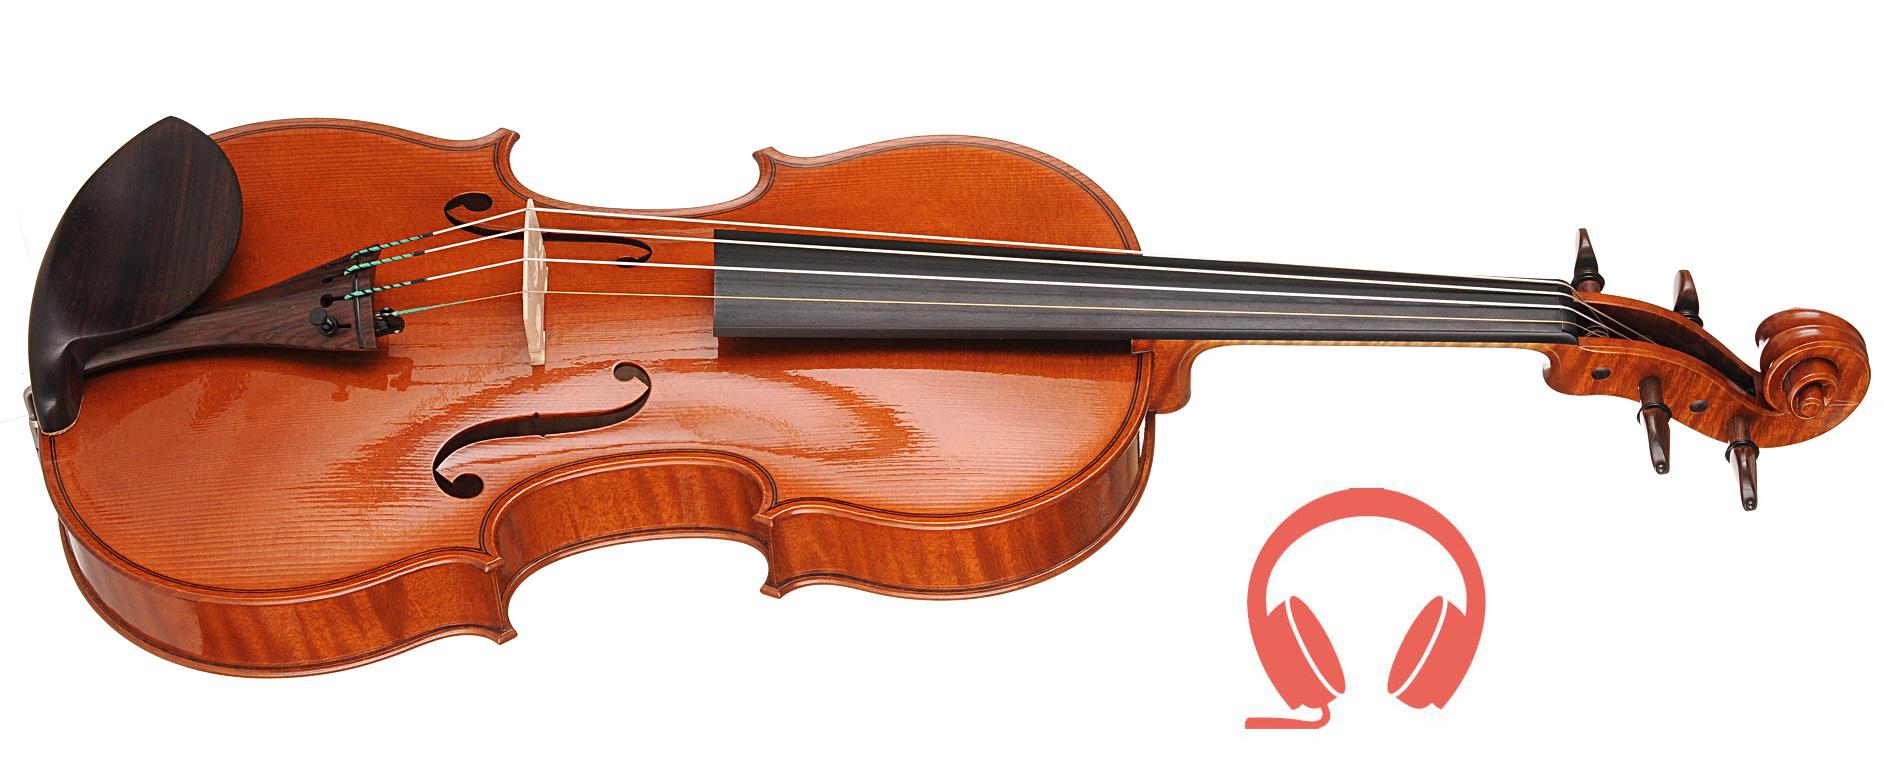 Gonzalo Bayolo (Spain) - Finalist, violin Angel | binaural audio recording, chamber hall | 13th International H. Wieniawski Violin Making Competition (2016)